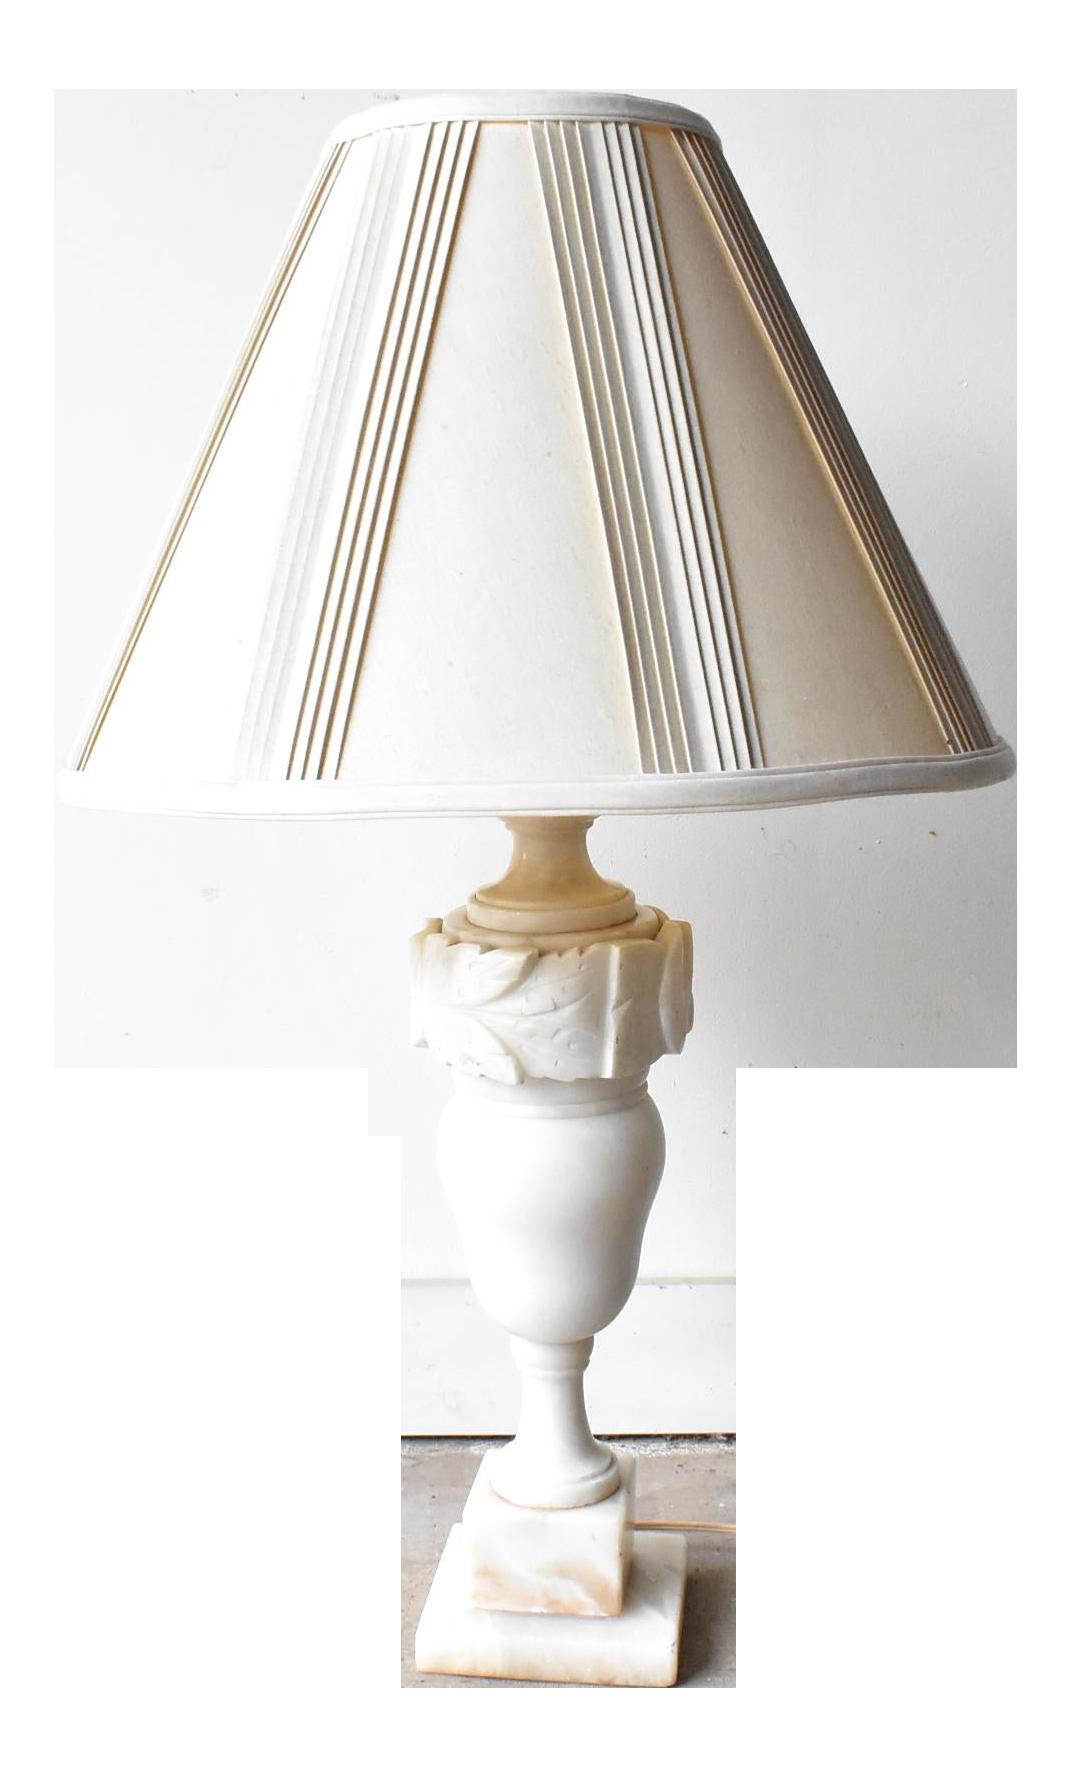 ANTIQUE VINTAGE FRENCH marble alabaster table lamp light